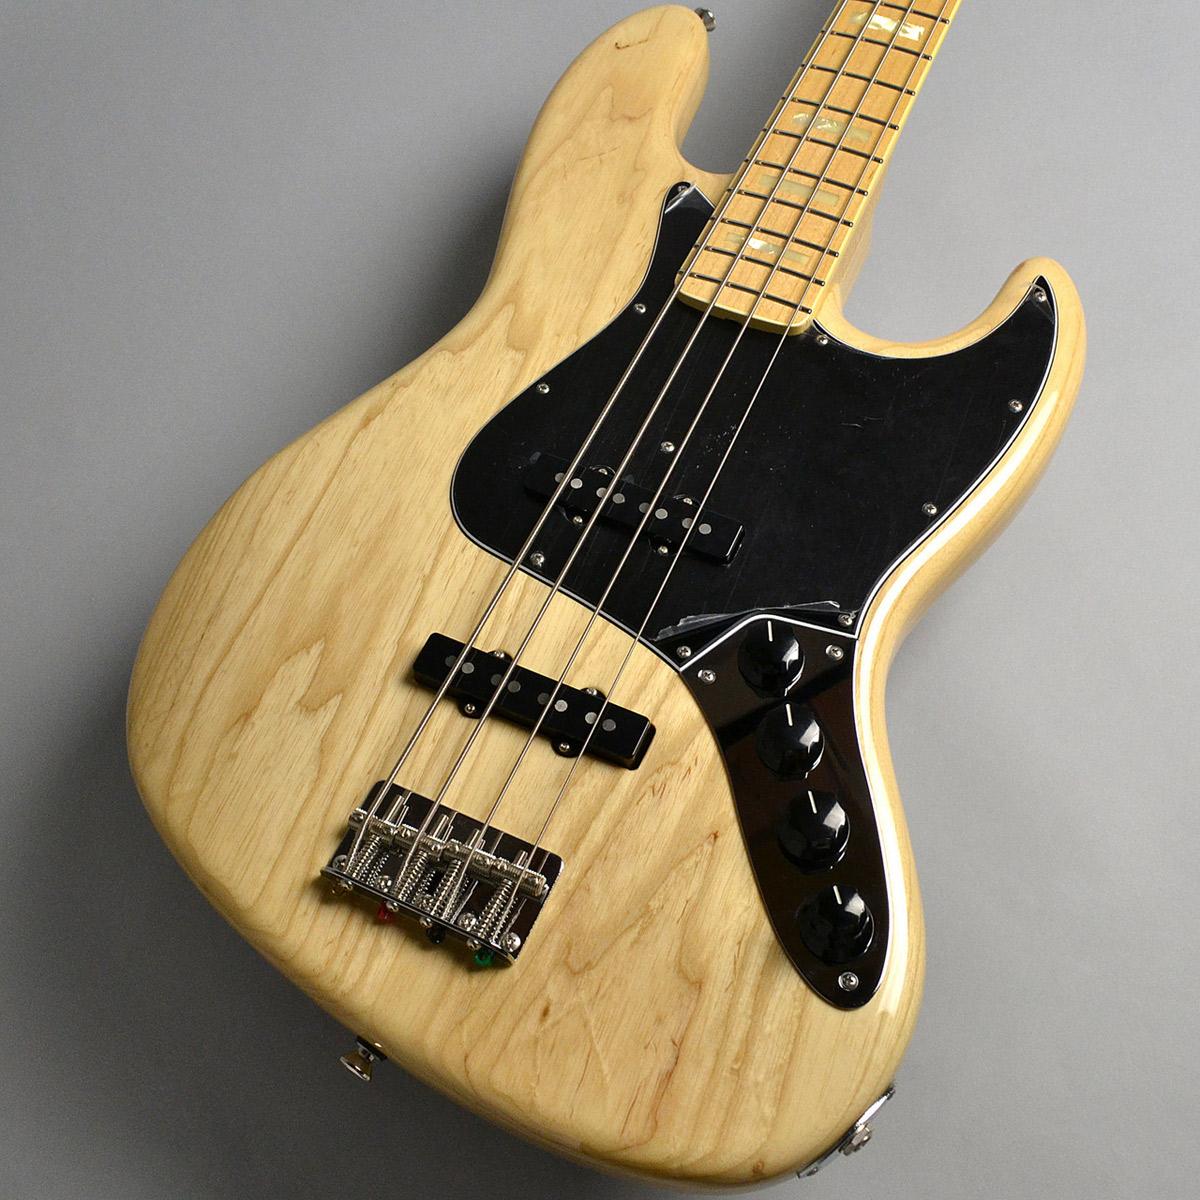 Freedom Custom Guitar Research Retrospective JB 4st Active Natural アクティブジャズベース 【フリーダム】【新宿PePe店】